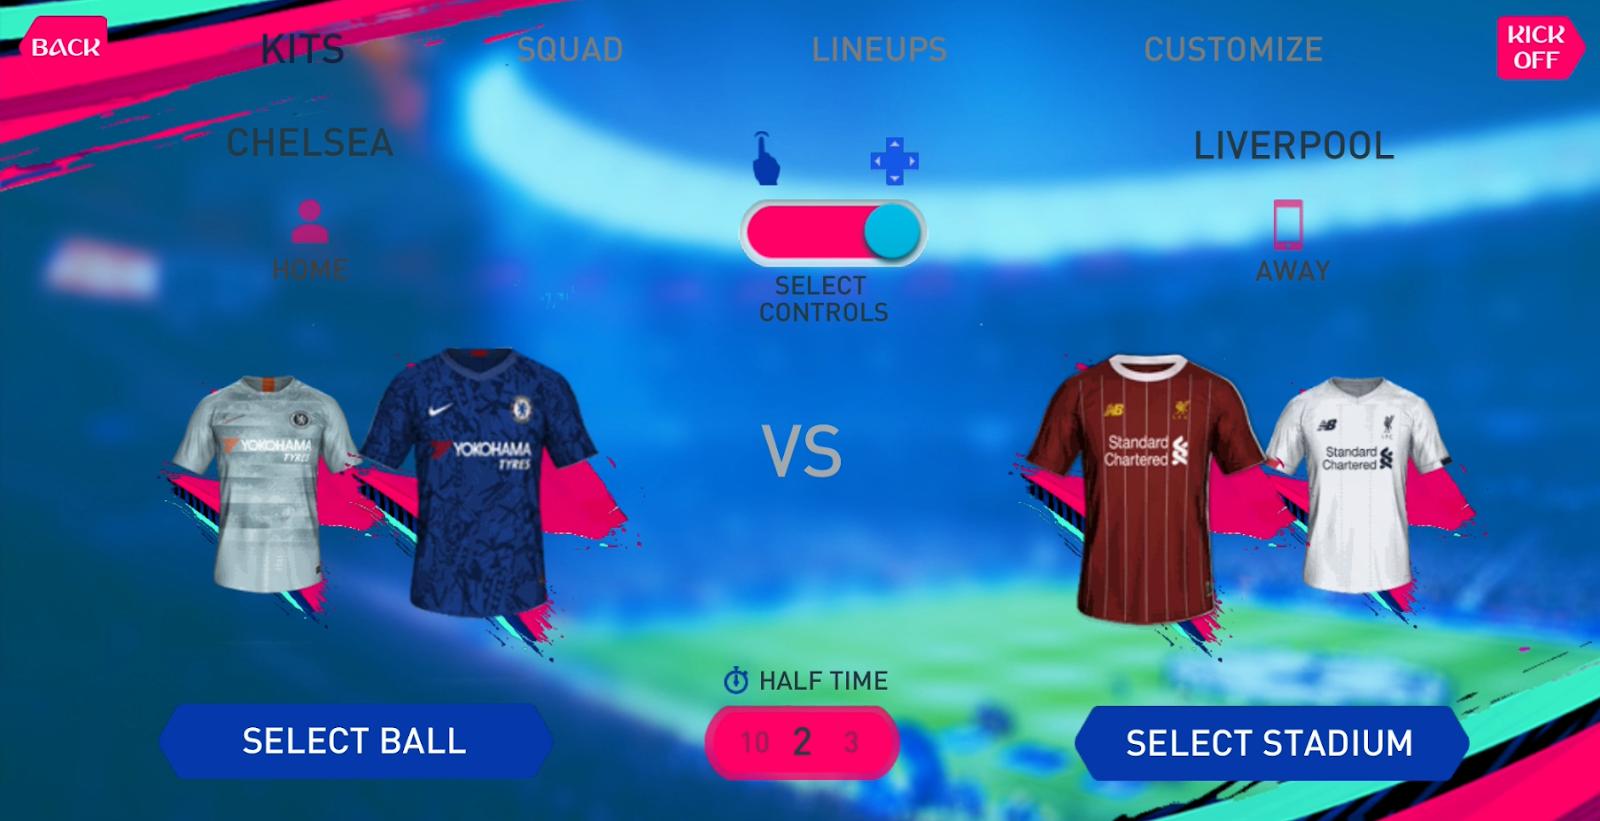 FIFA 19 MOD FIFA 14 Android Offline 900 MB New Menu Kits 2020 & Transfers Update Best Graphics